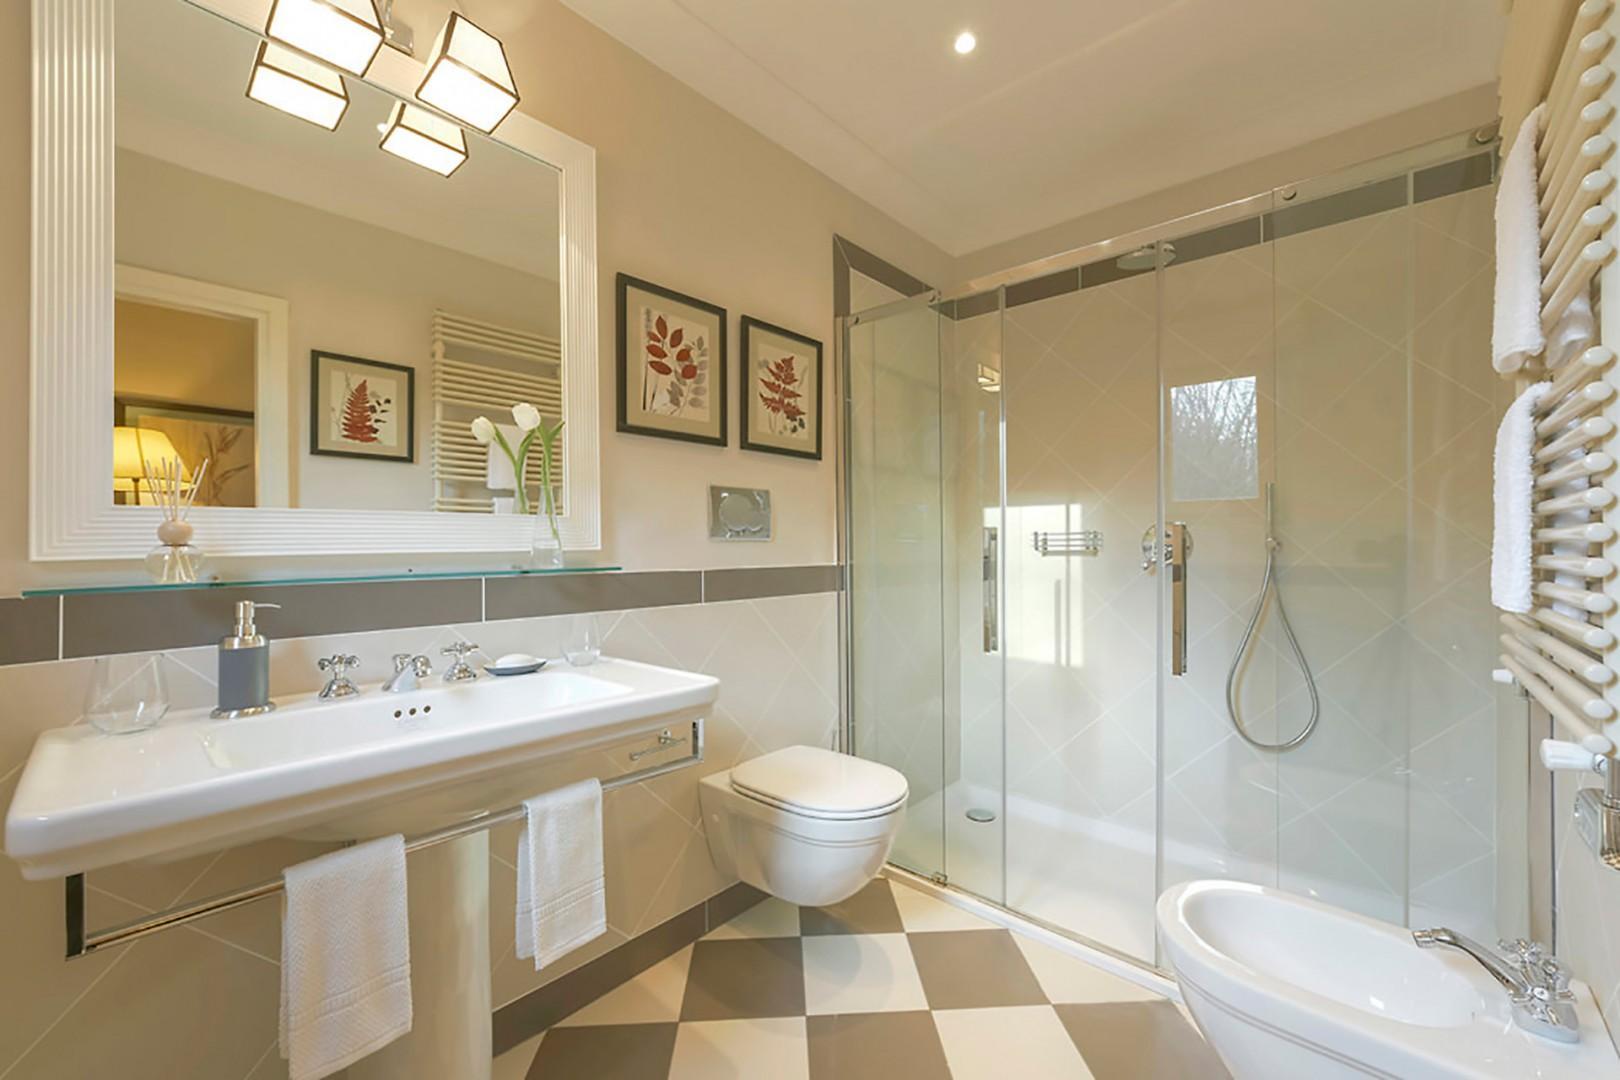 Cottage bathroom with large shower.